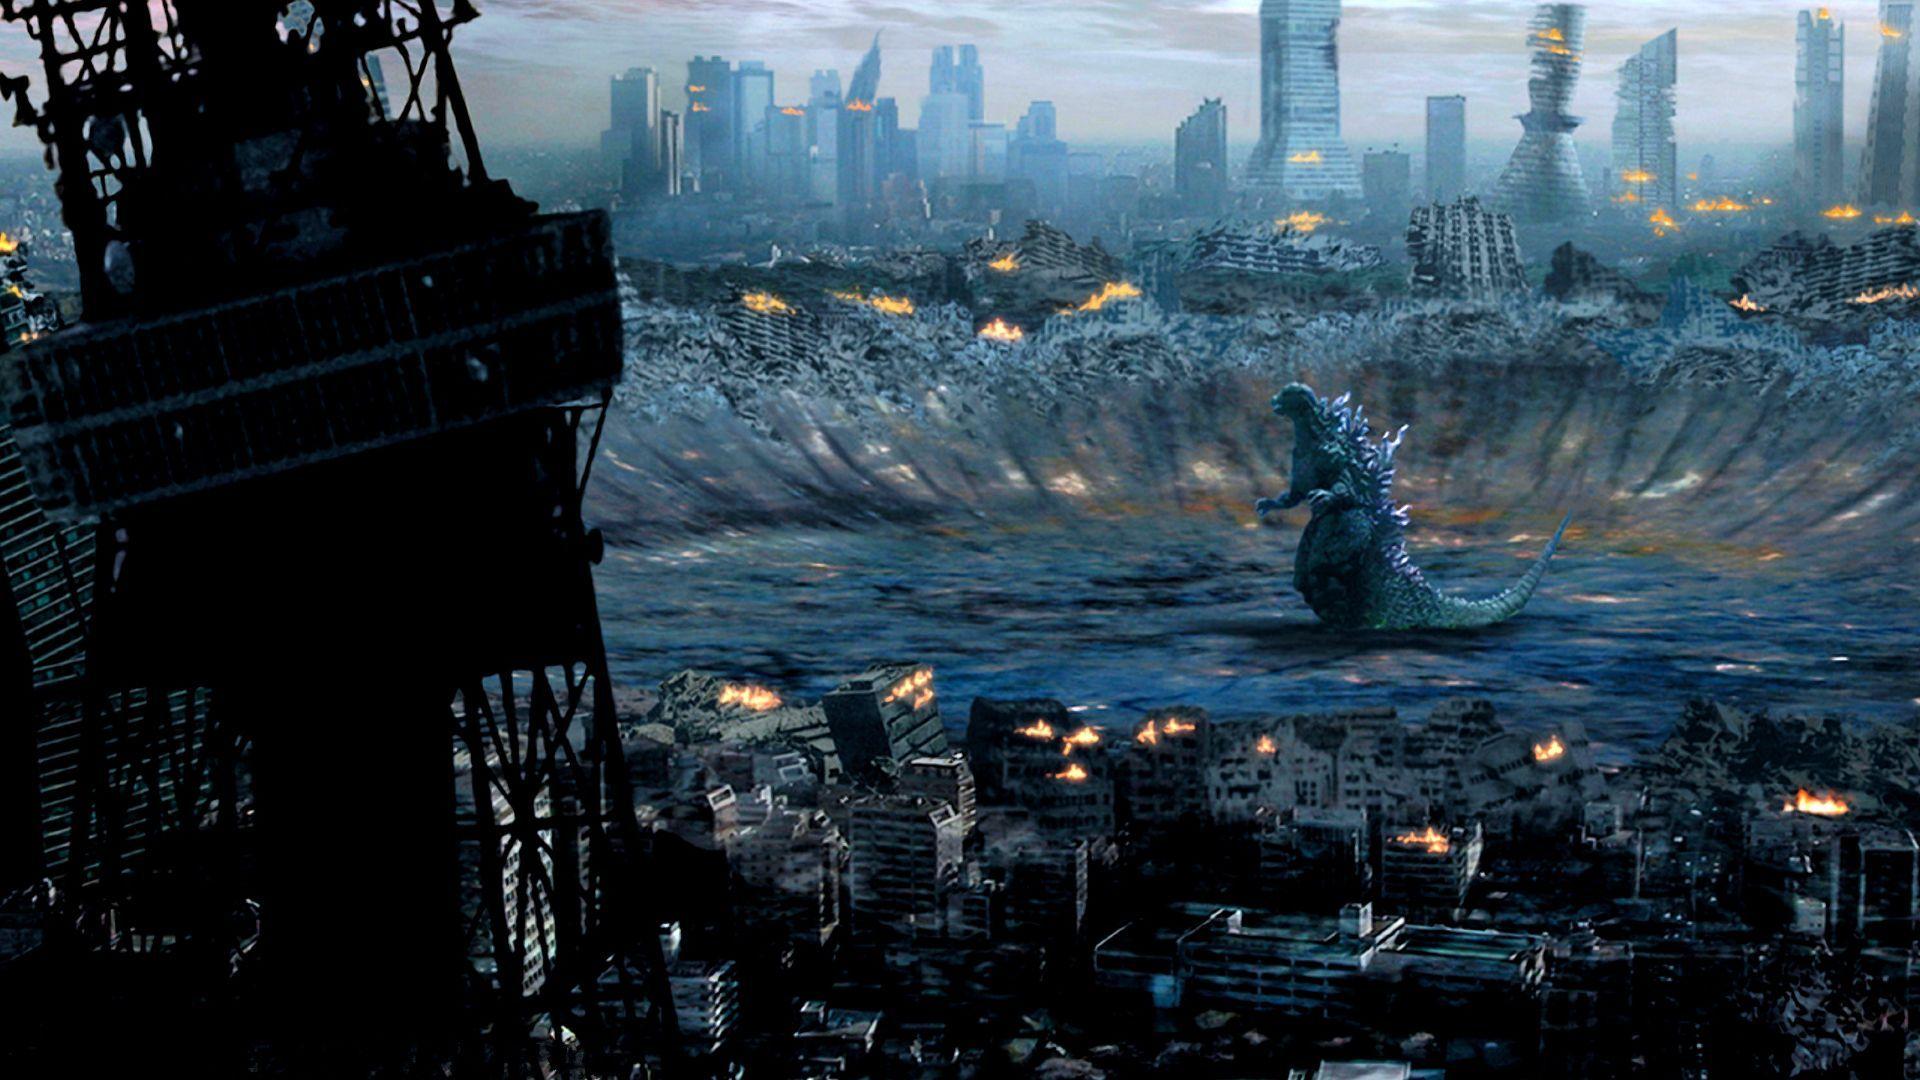 Godzilla 2014 HD pictures